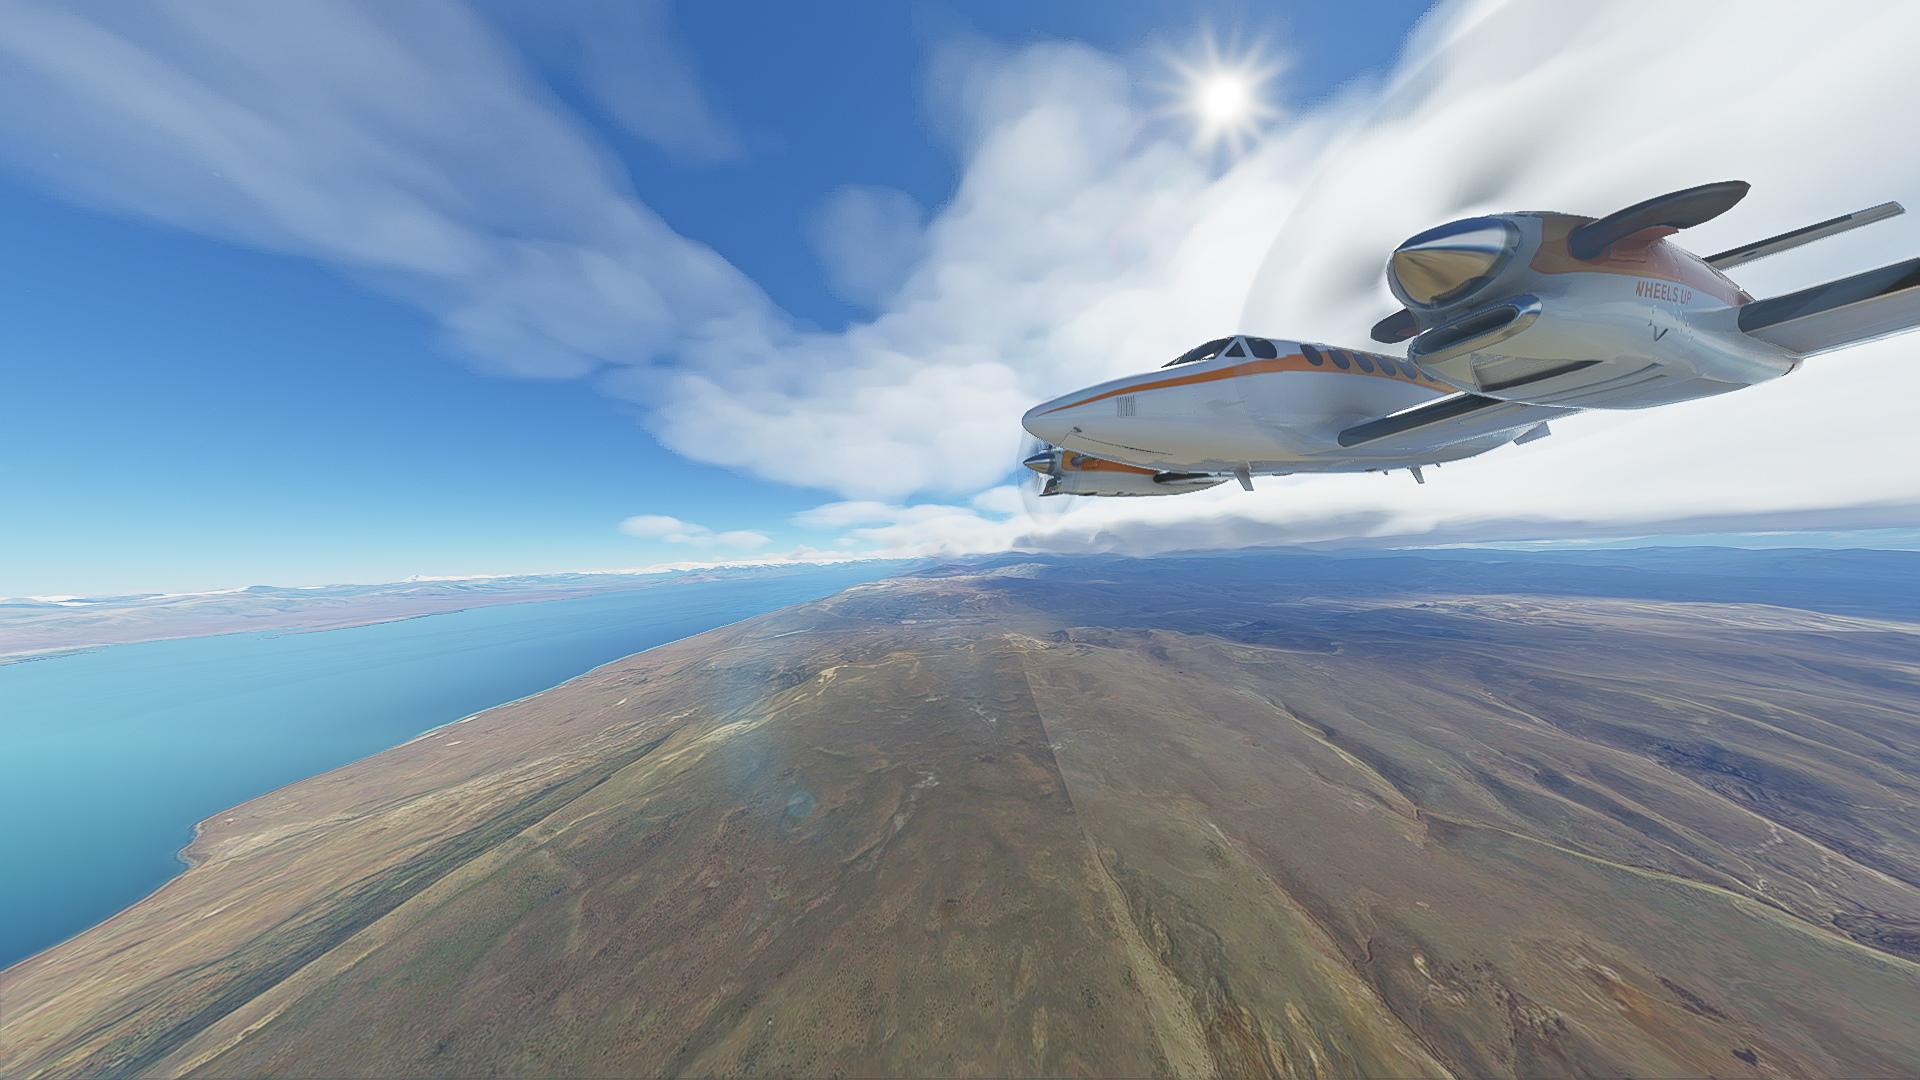 microsoft-flight-simulator-–-world-update-3-launches-next-week